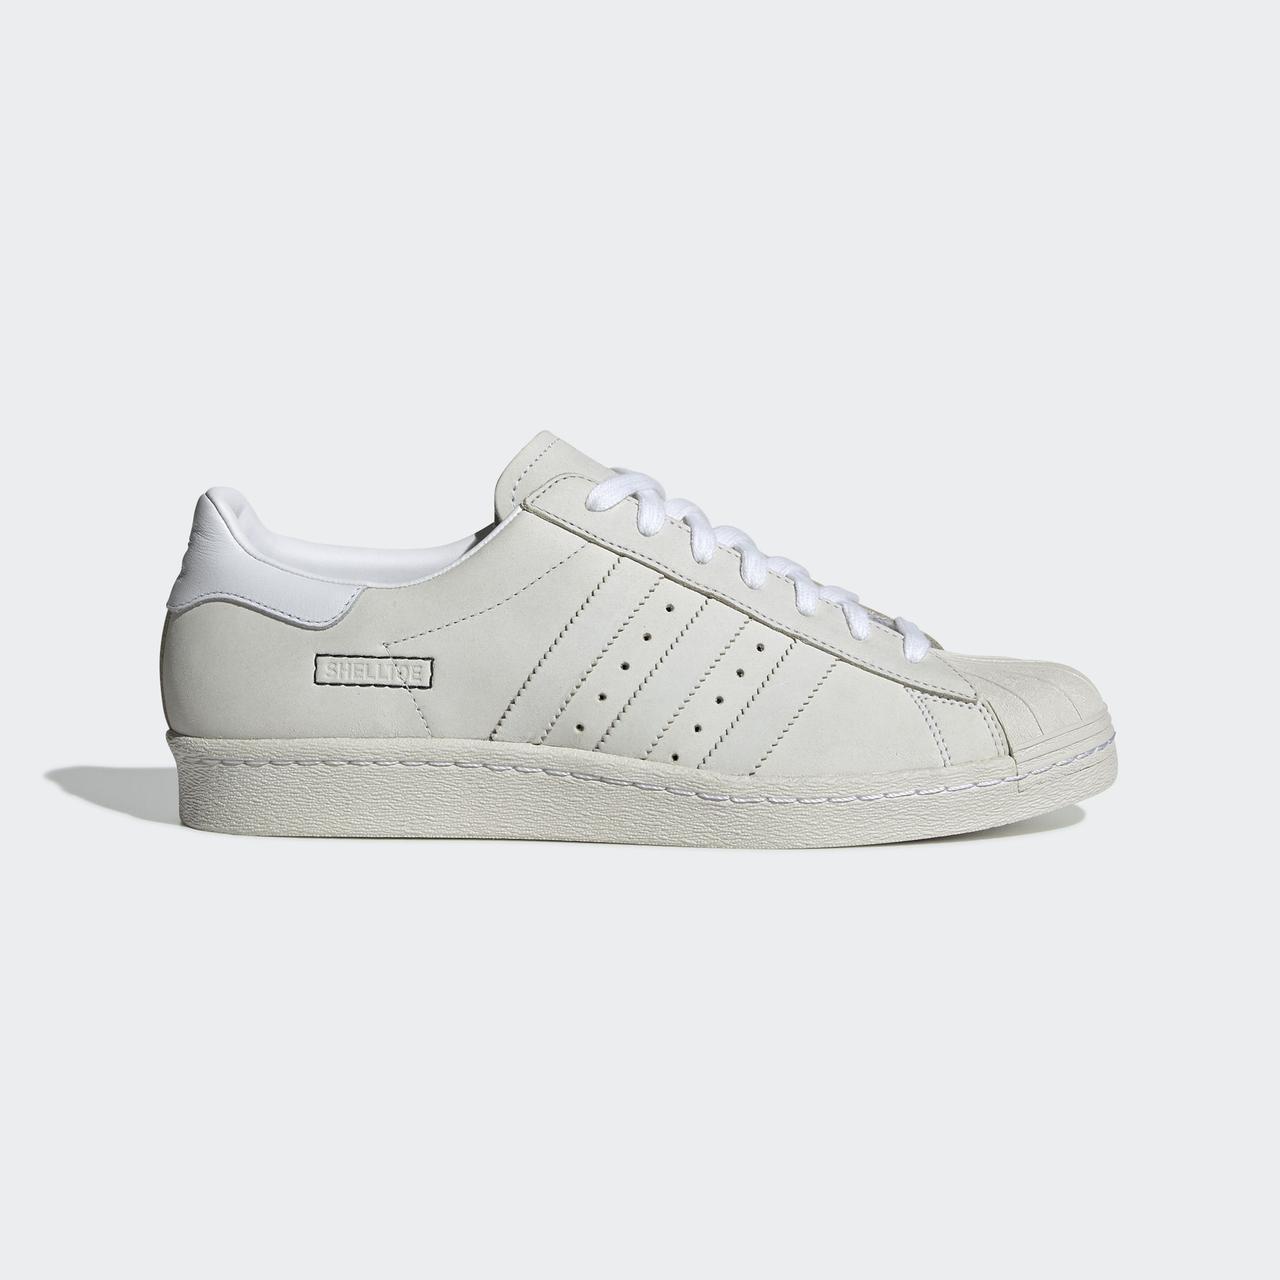 ??????? ????????? adidas Superstar 80s DB2685 2019